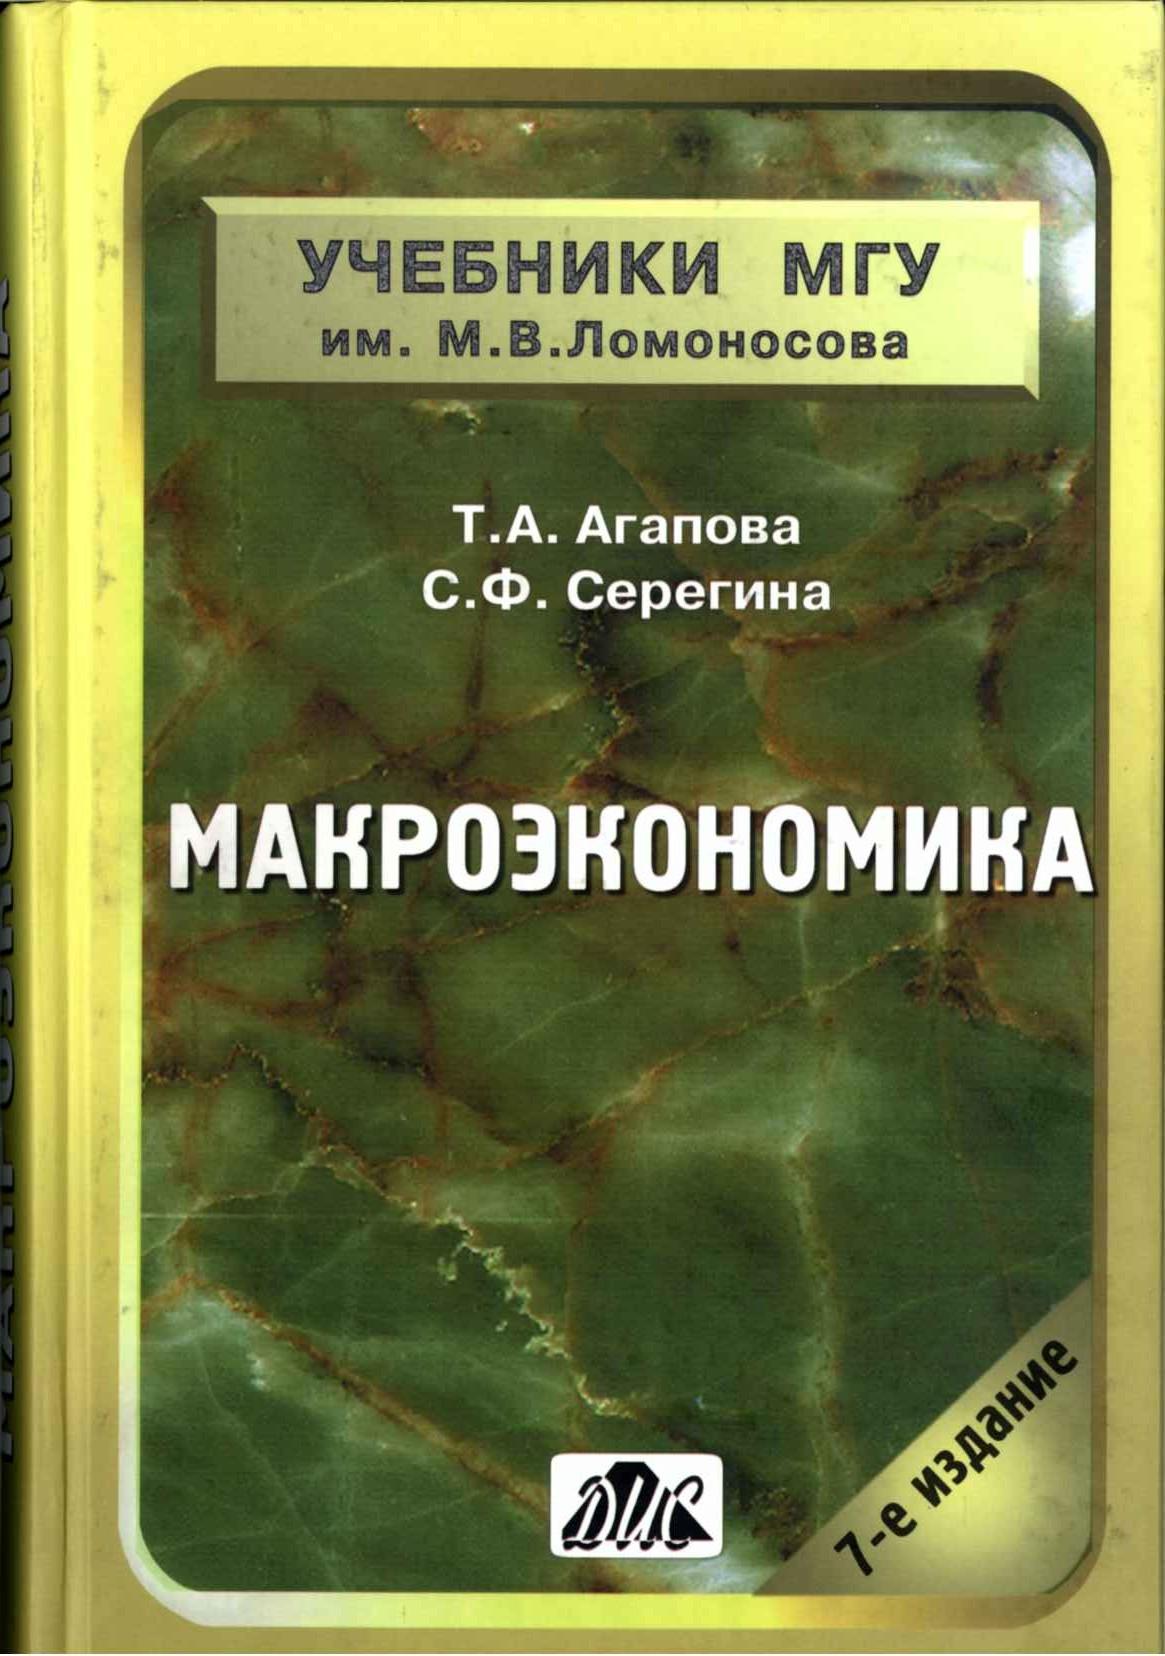 book Библия цифровой